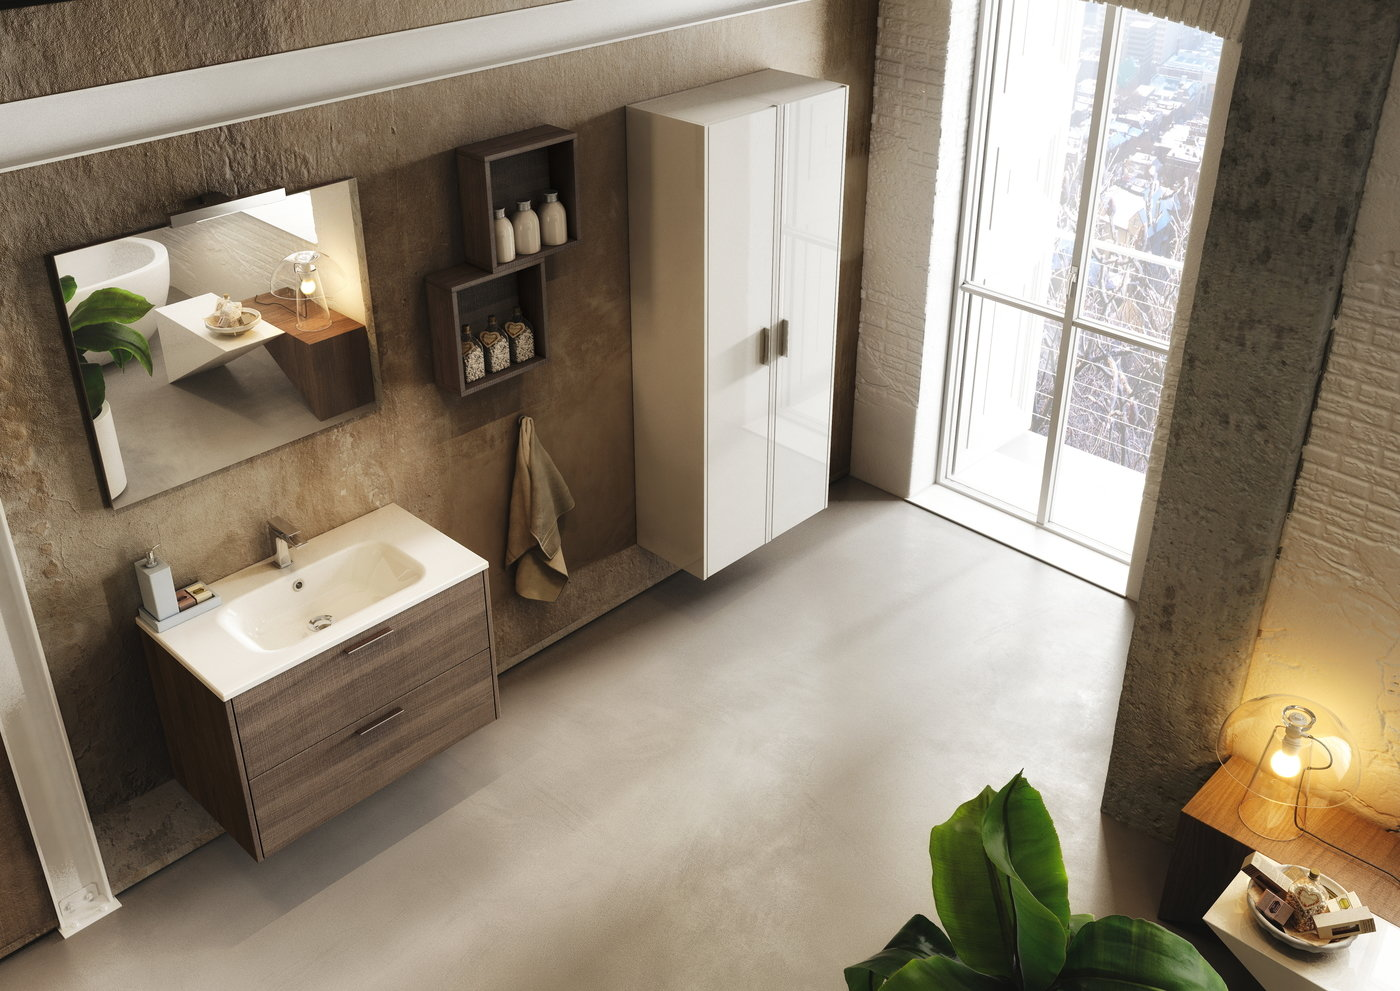 Cgi Bathroom Furniture Xl Today By Filippo Petrucci At Coroflot Com